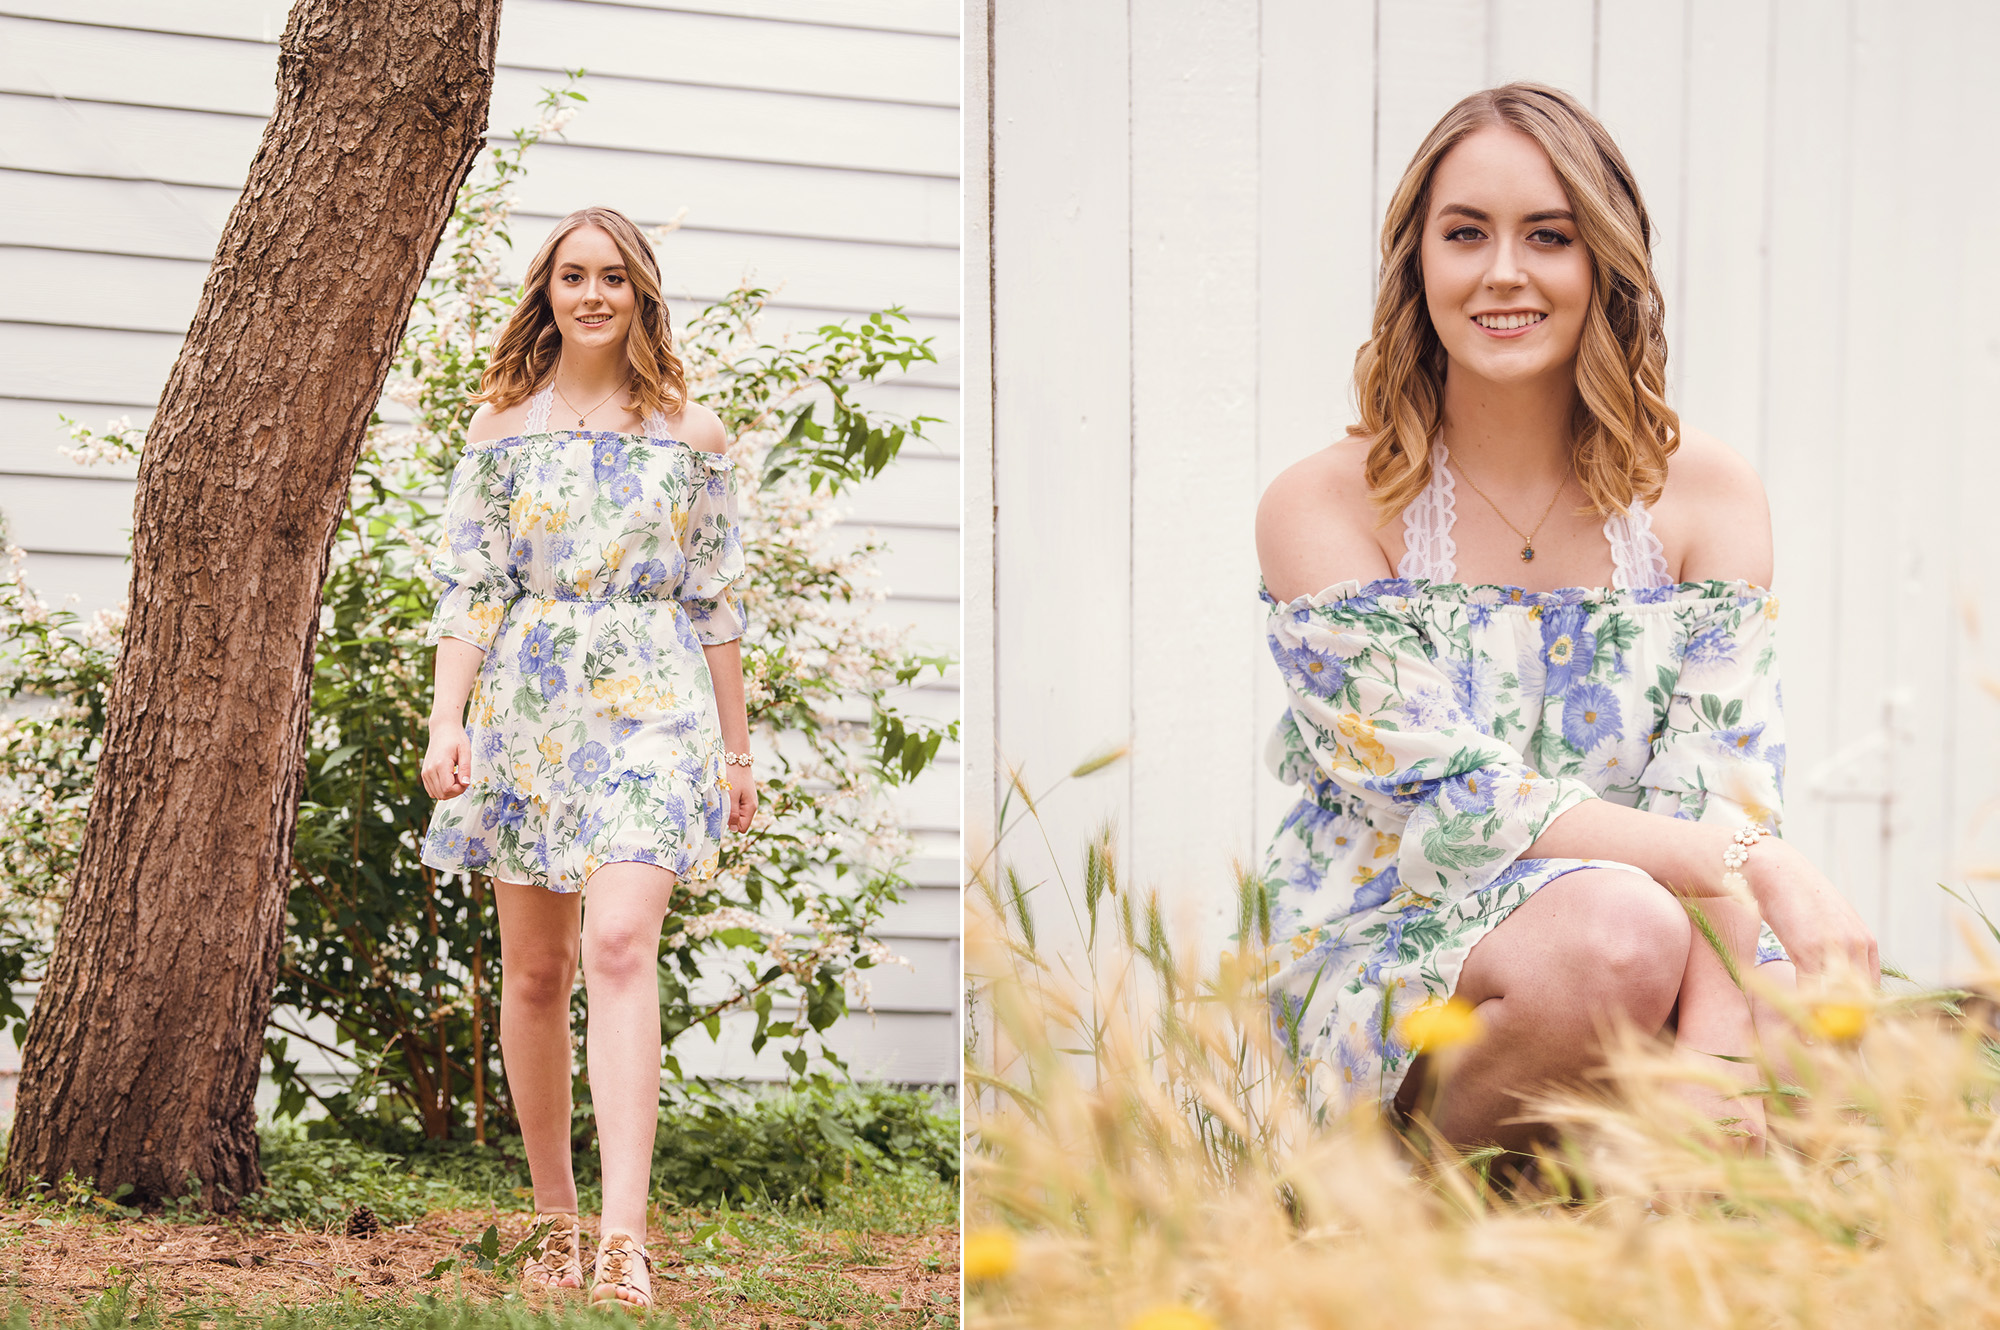 Studio B Portraits_Pretty high school senior in floral dress sitting in golden grass2.jpg